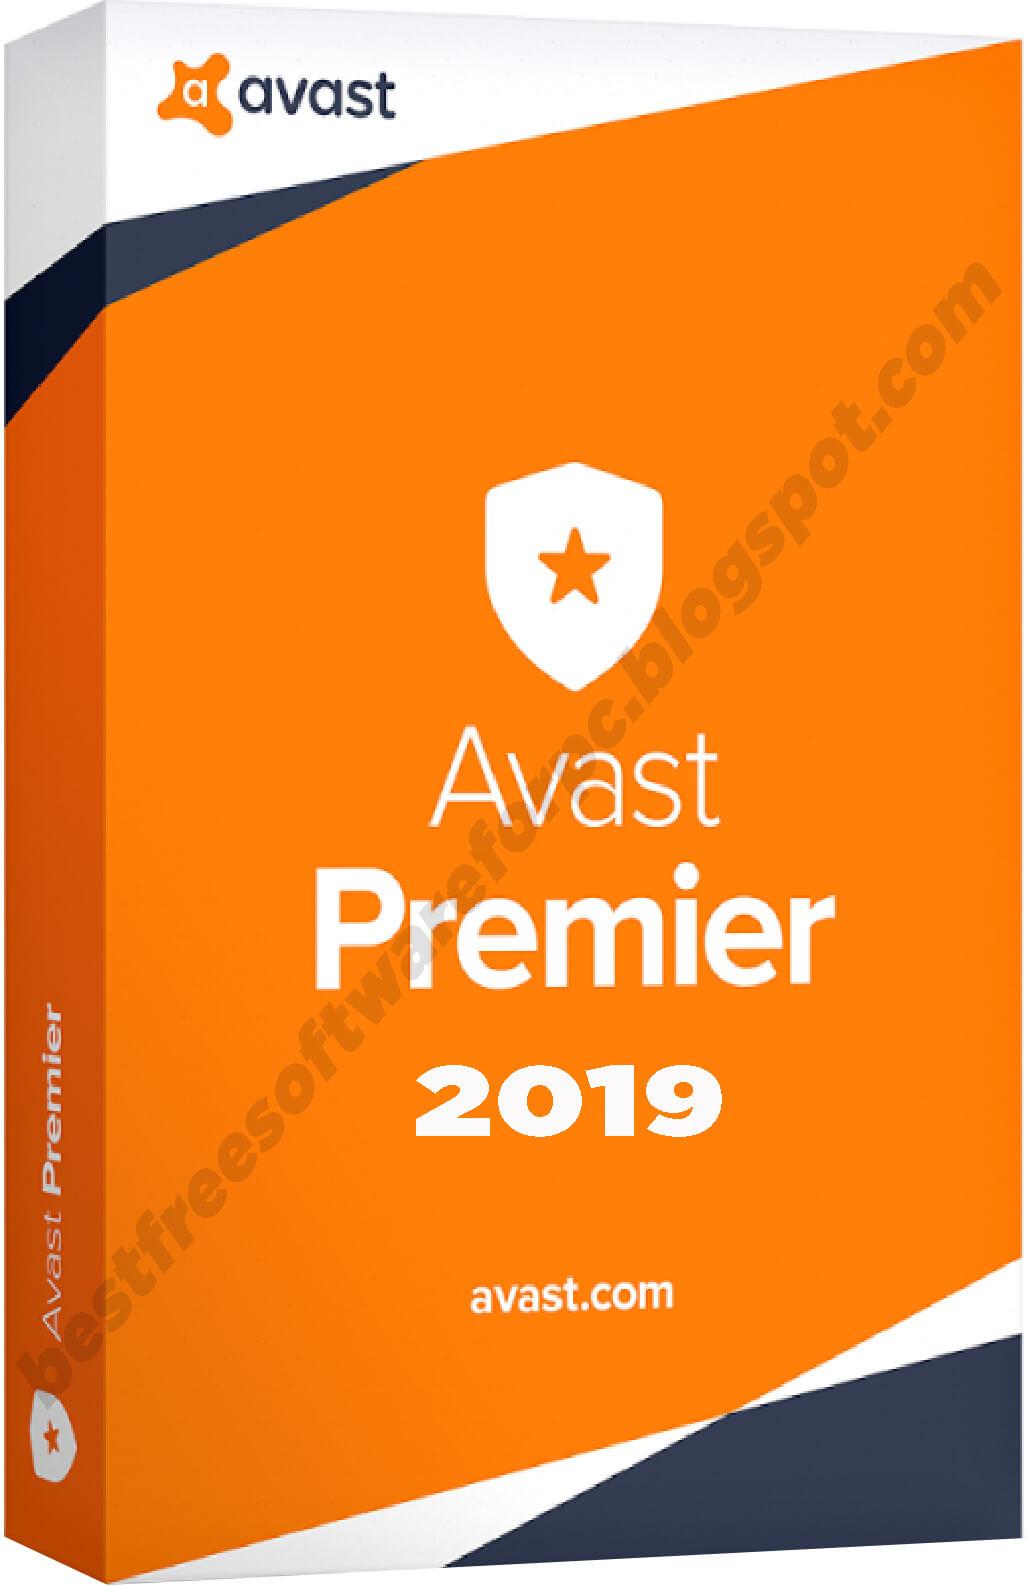 Avast Premier Antivirus 2019 serial number